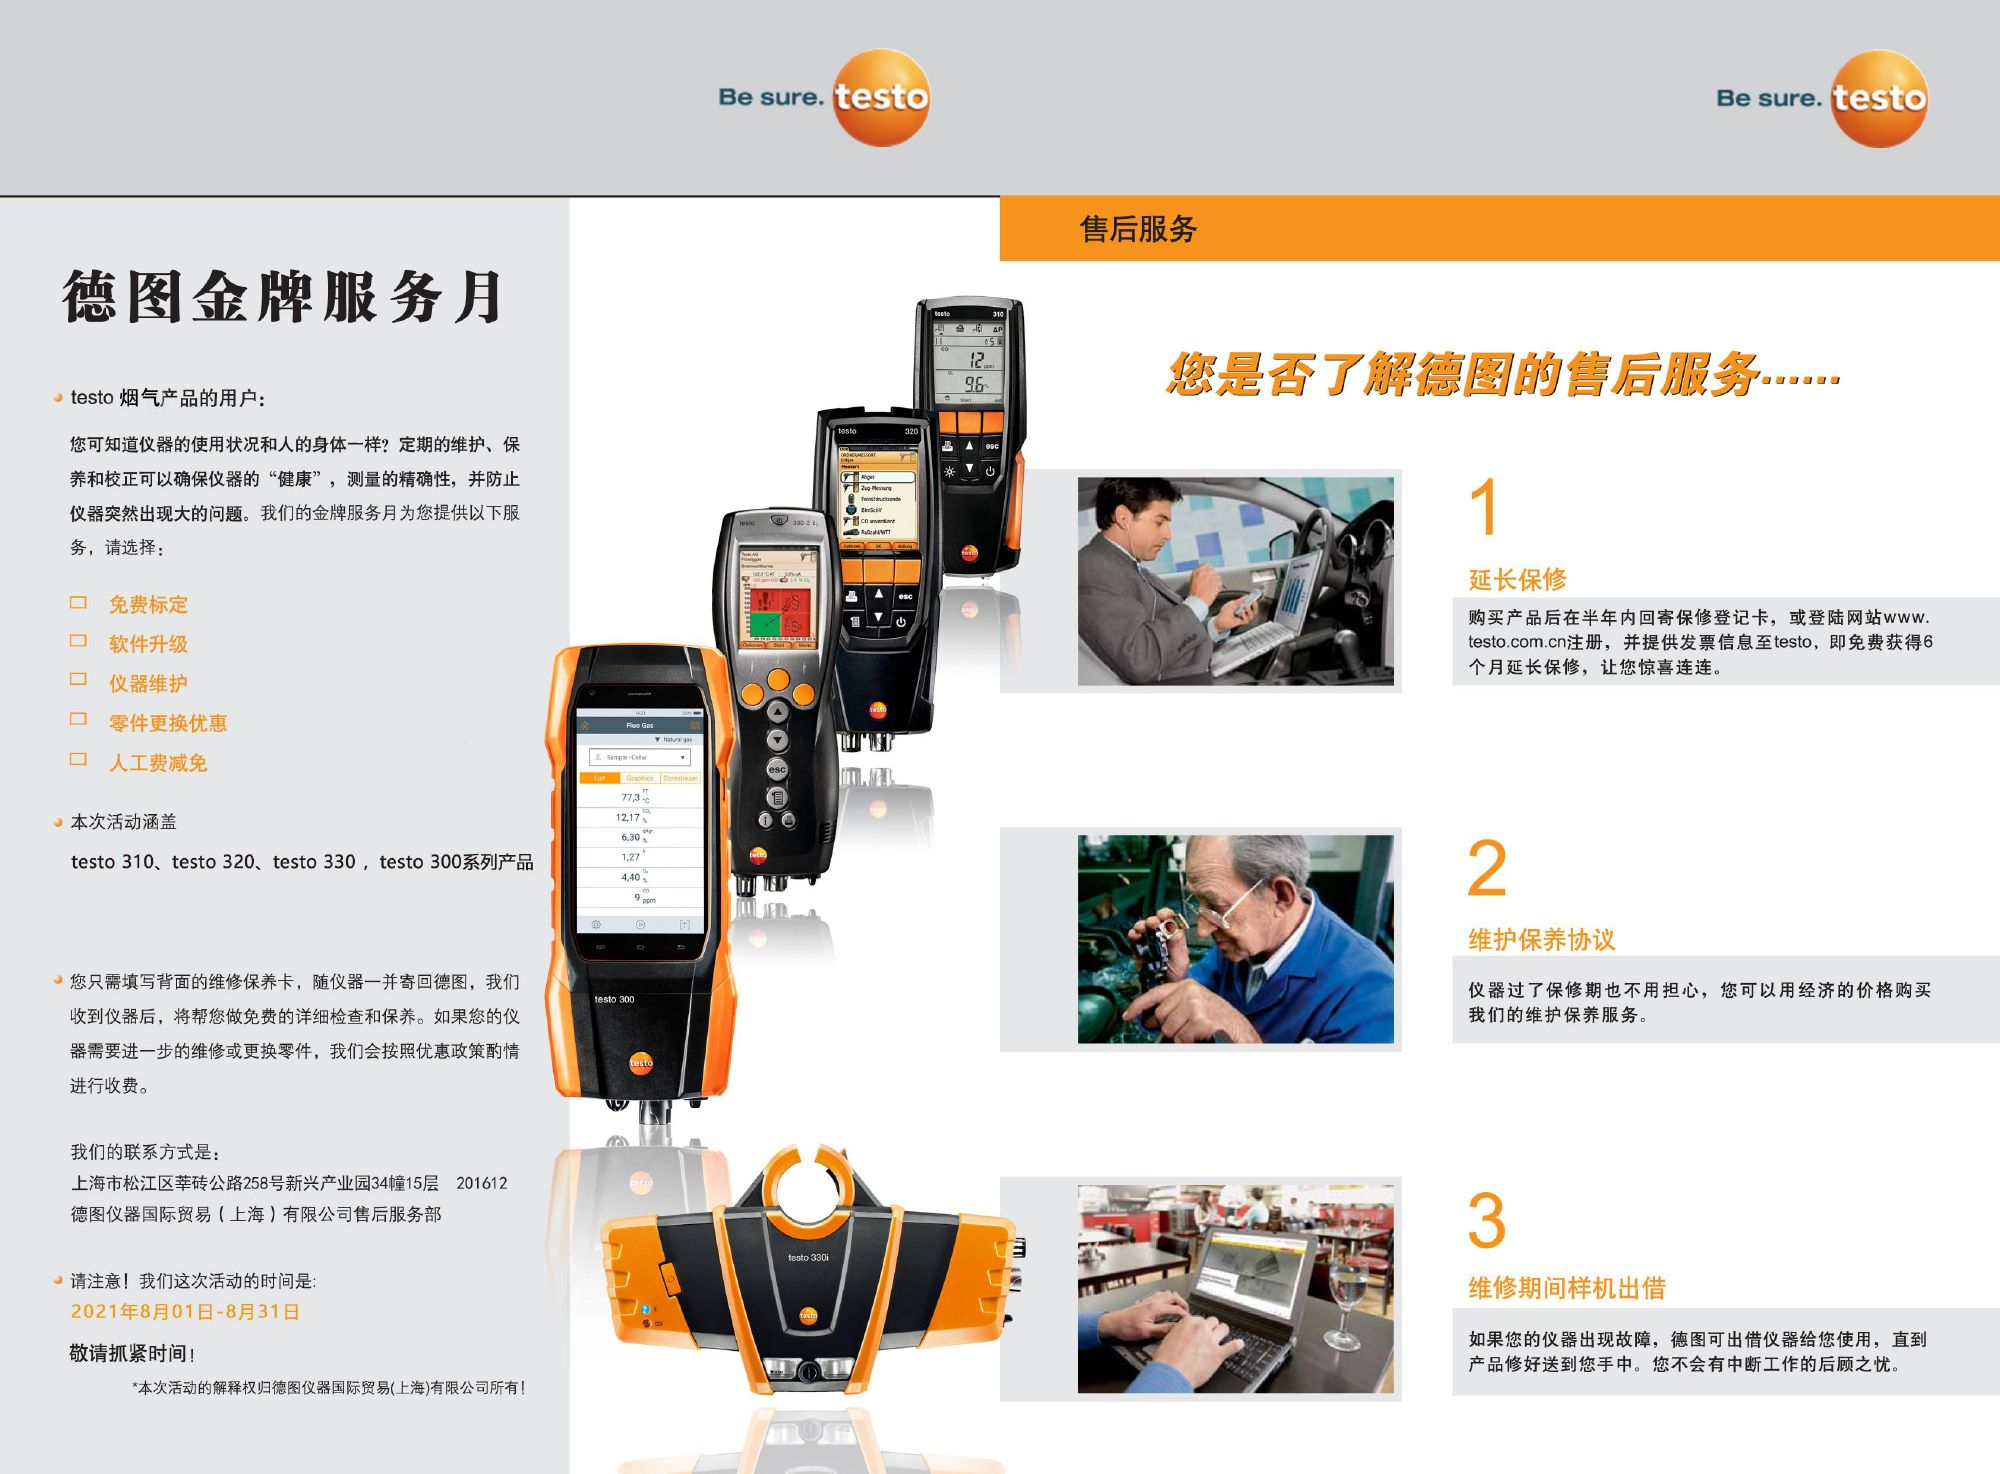 golden_service_Aug-20210802-2-CN.jpg